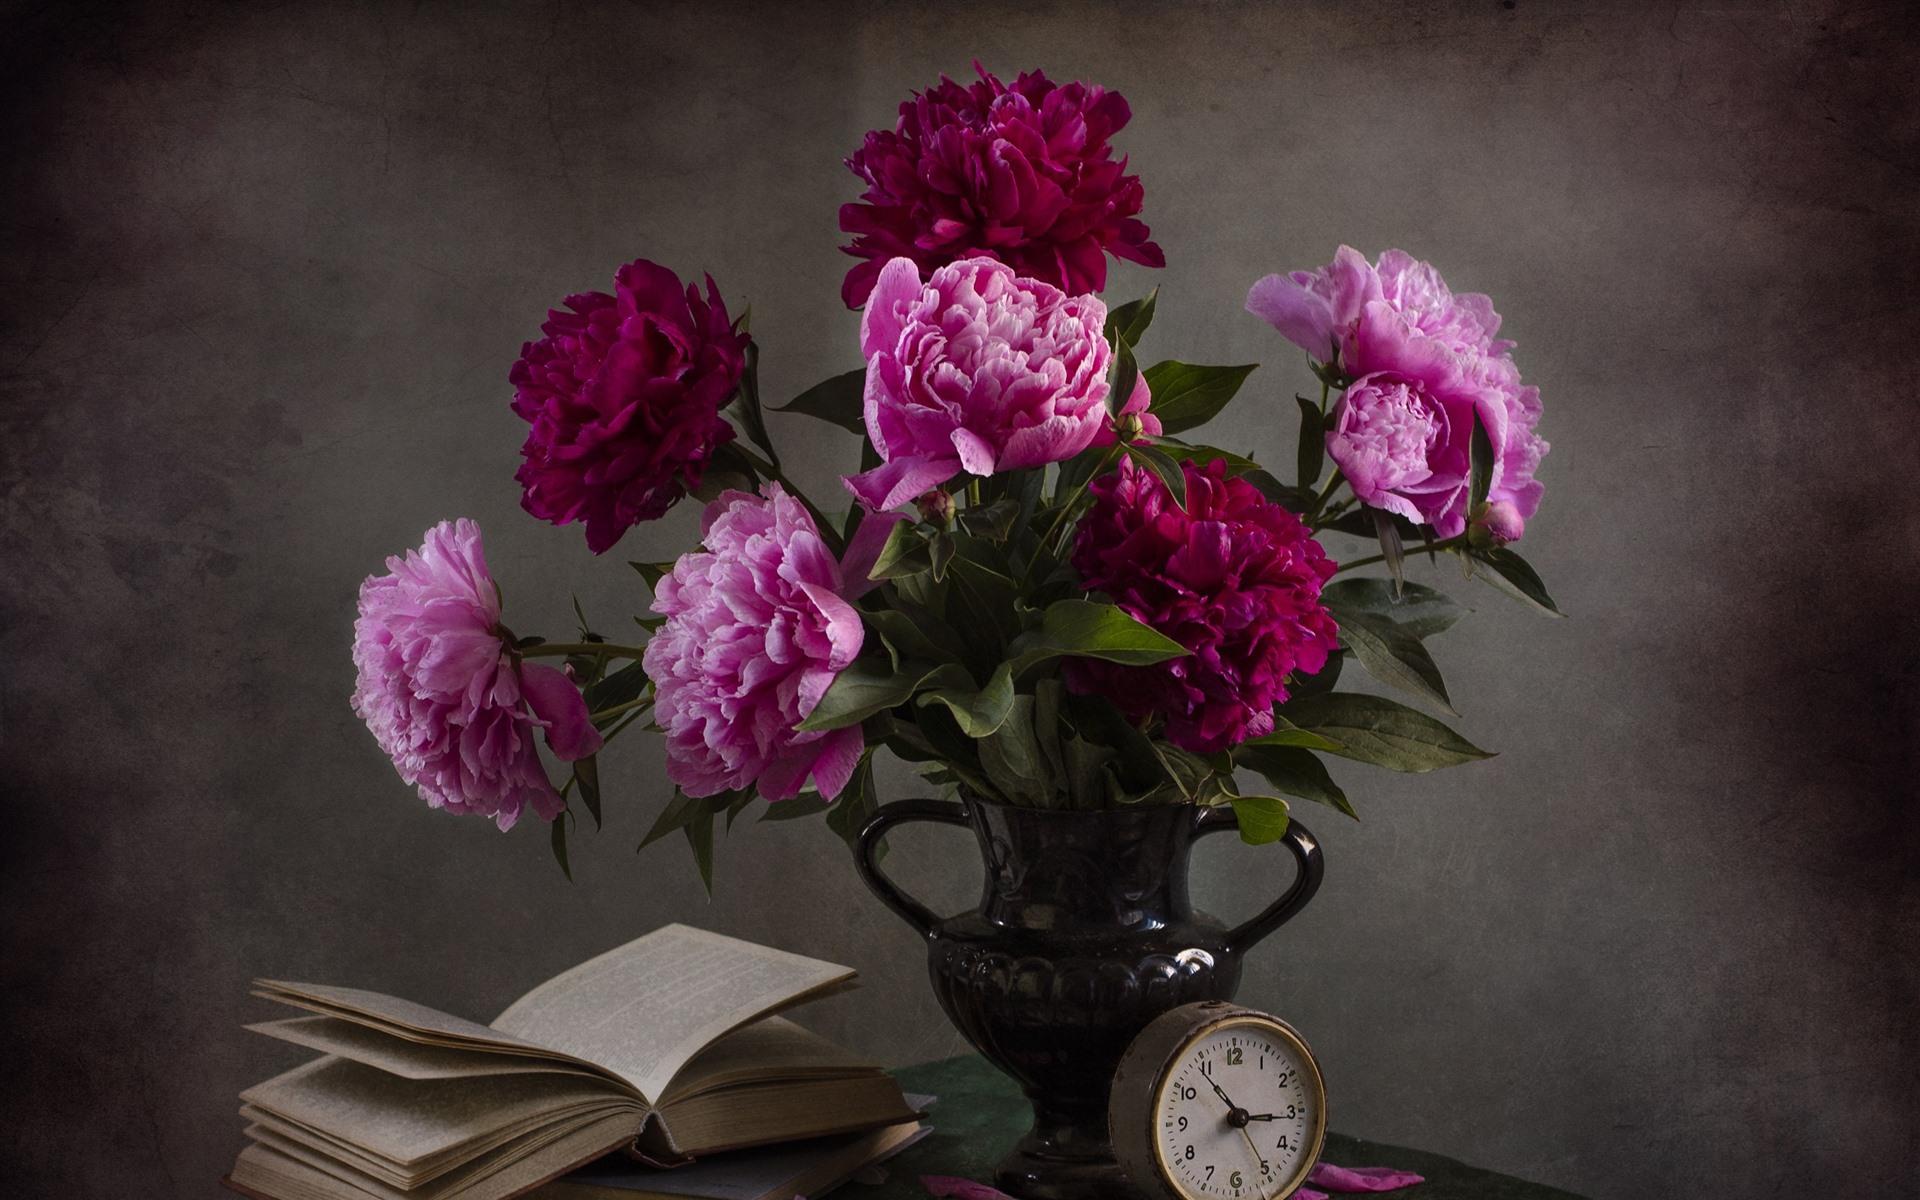 Fonds D 233 Cran Pivoines Roses Fleurs Vase Livre Horloge